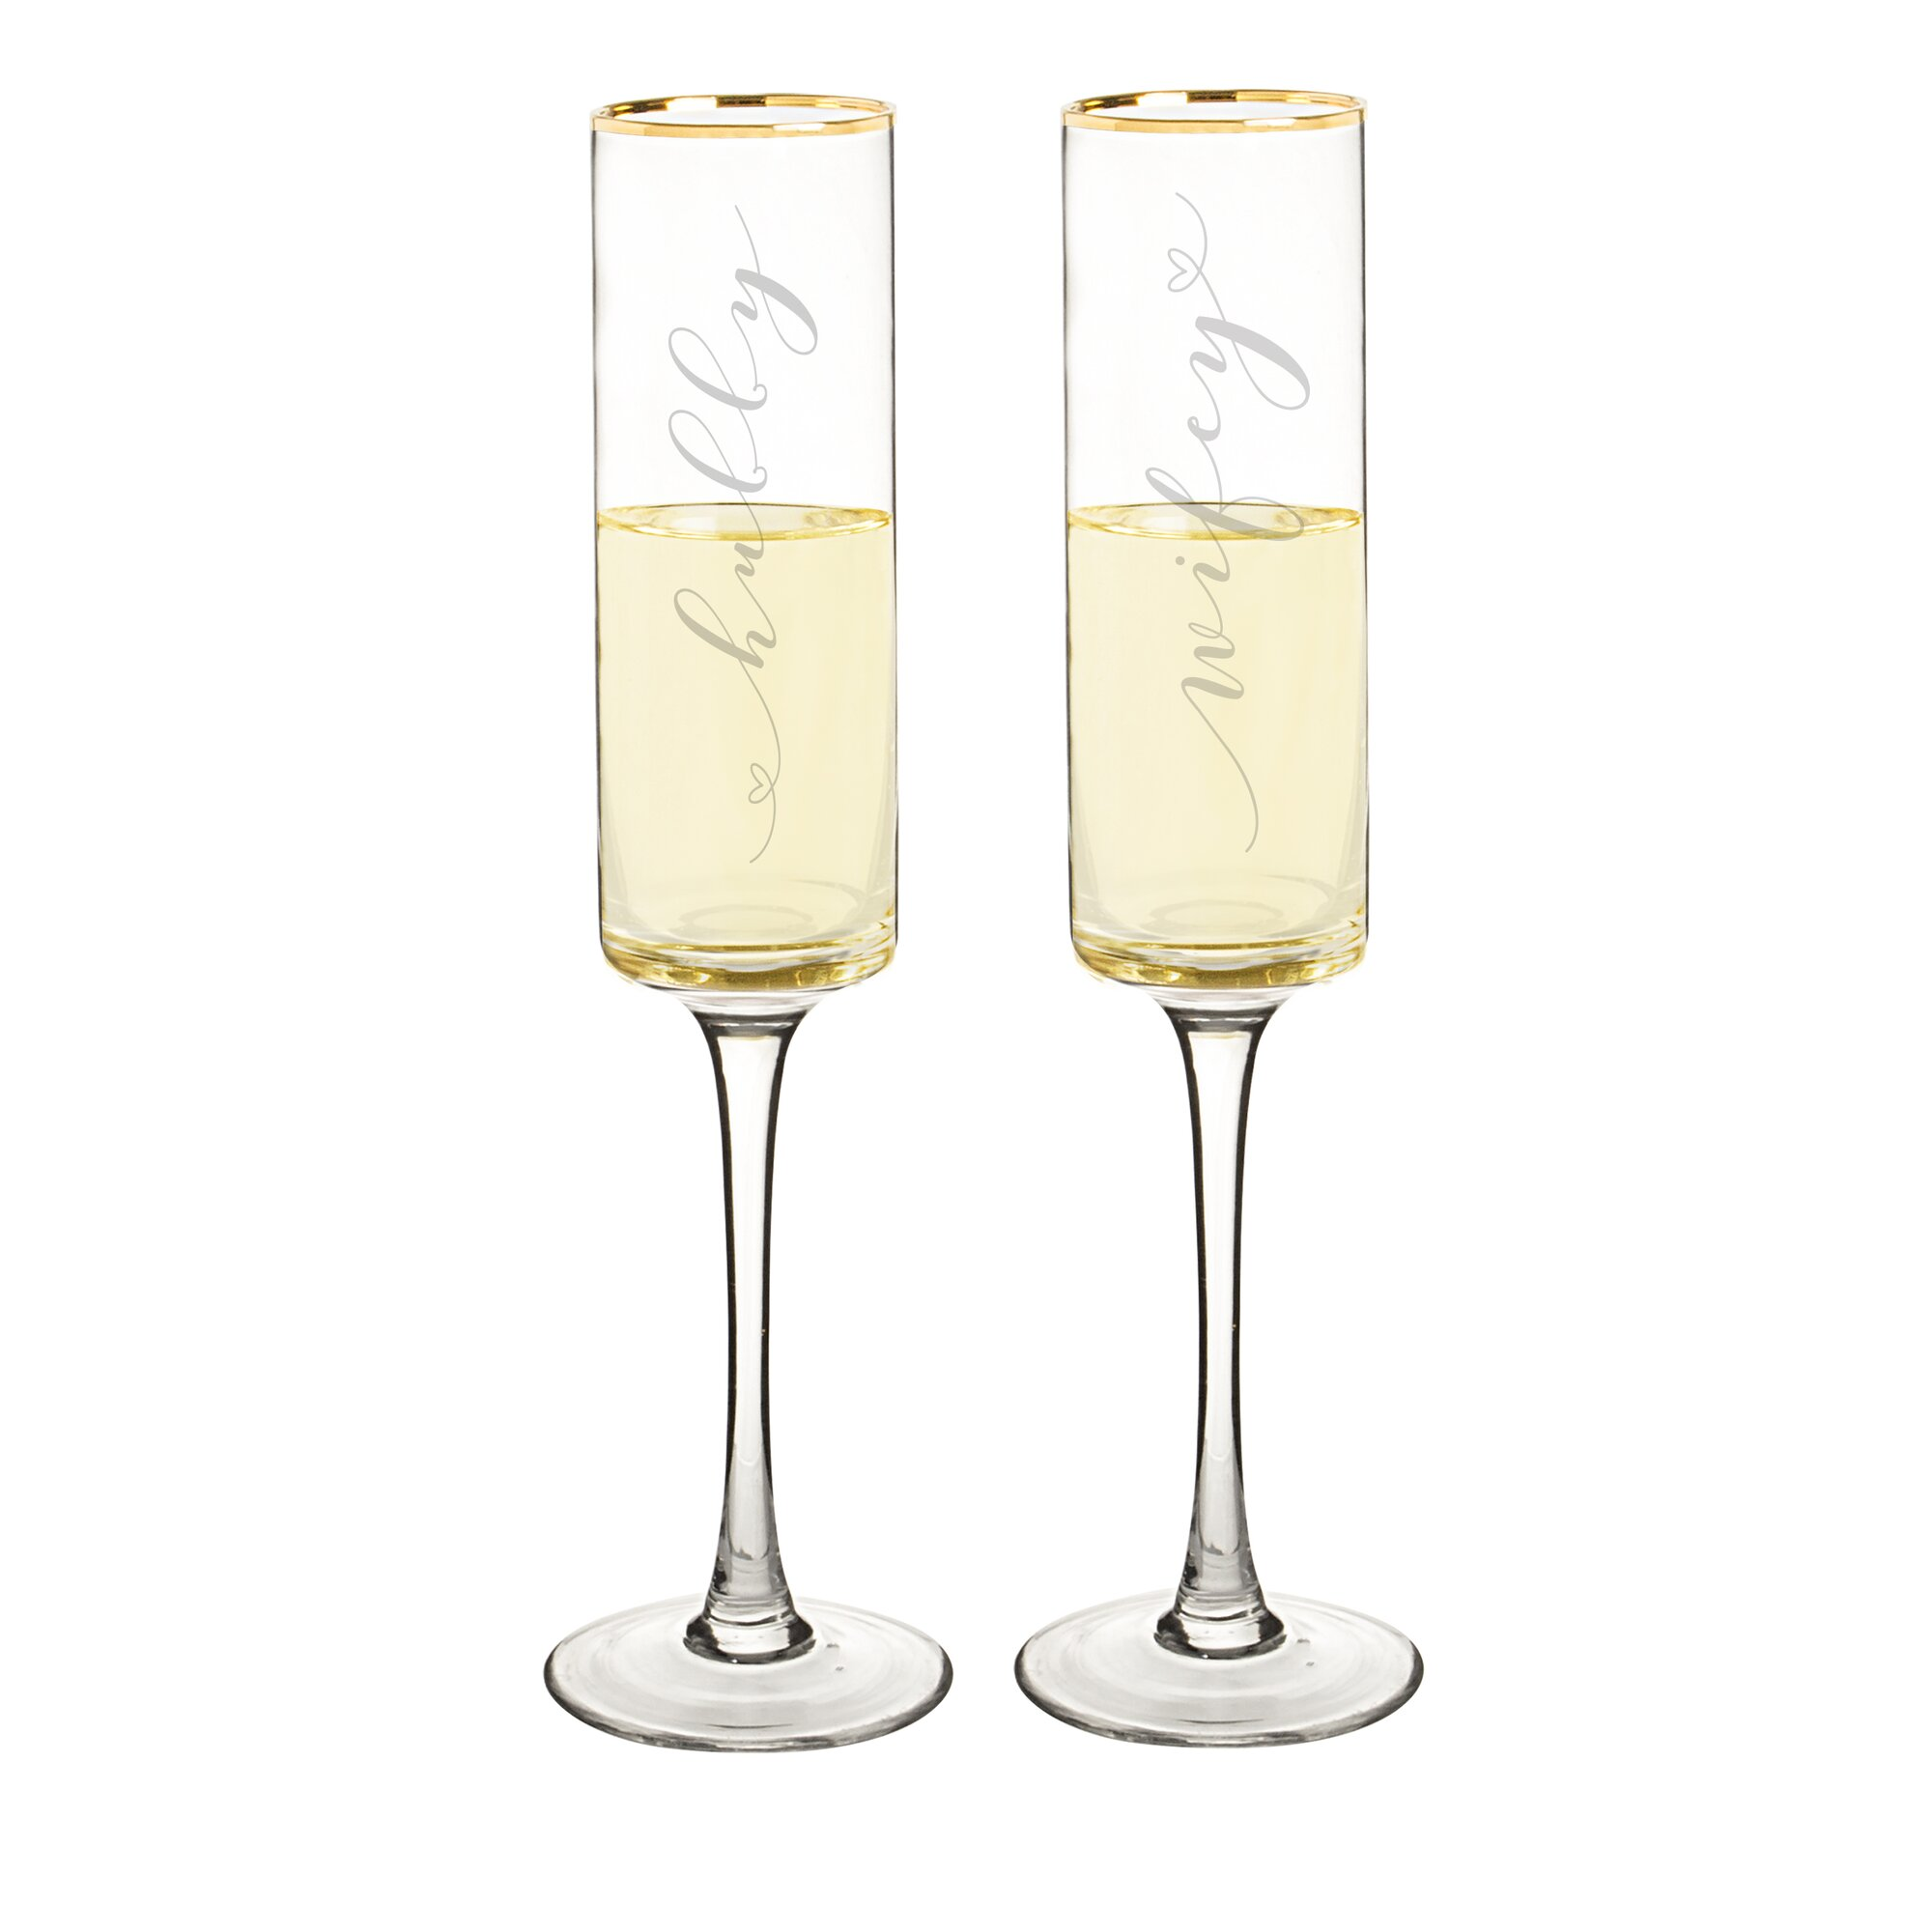 modern champagne flutes - modern champagne flutes